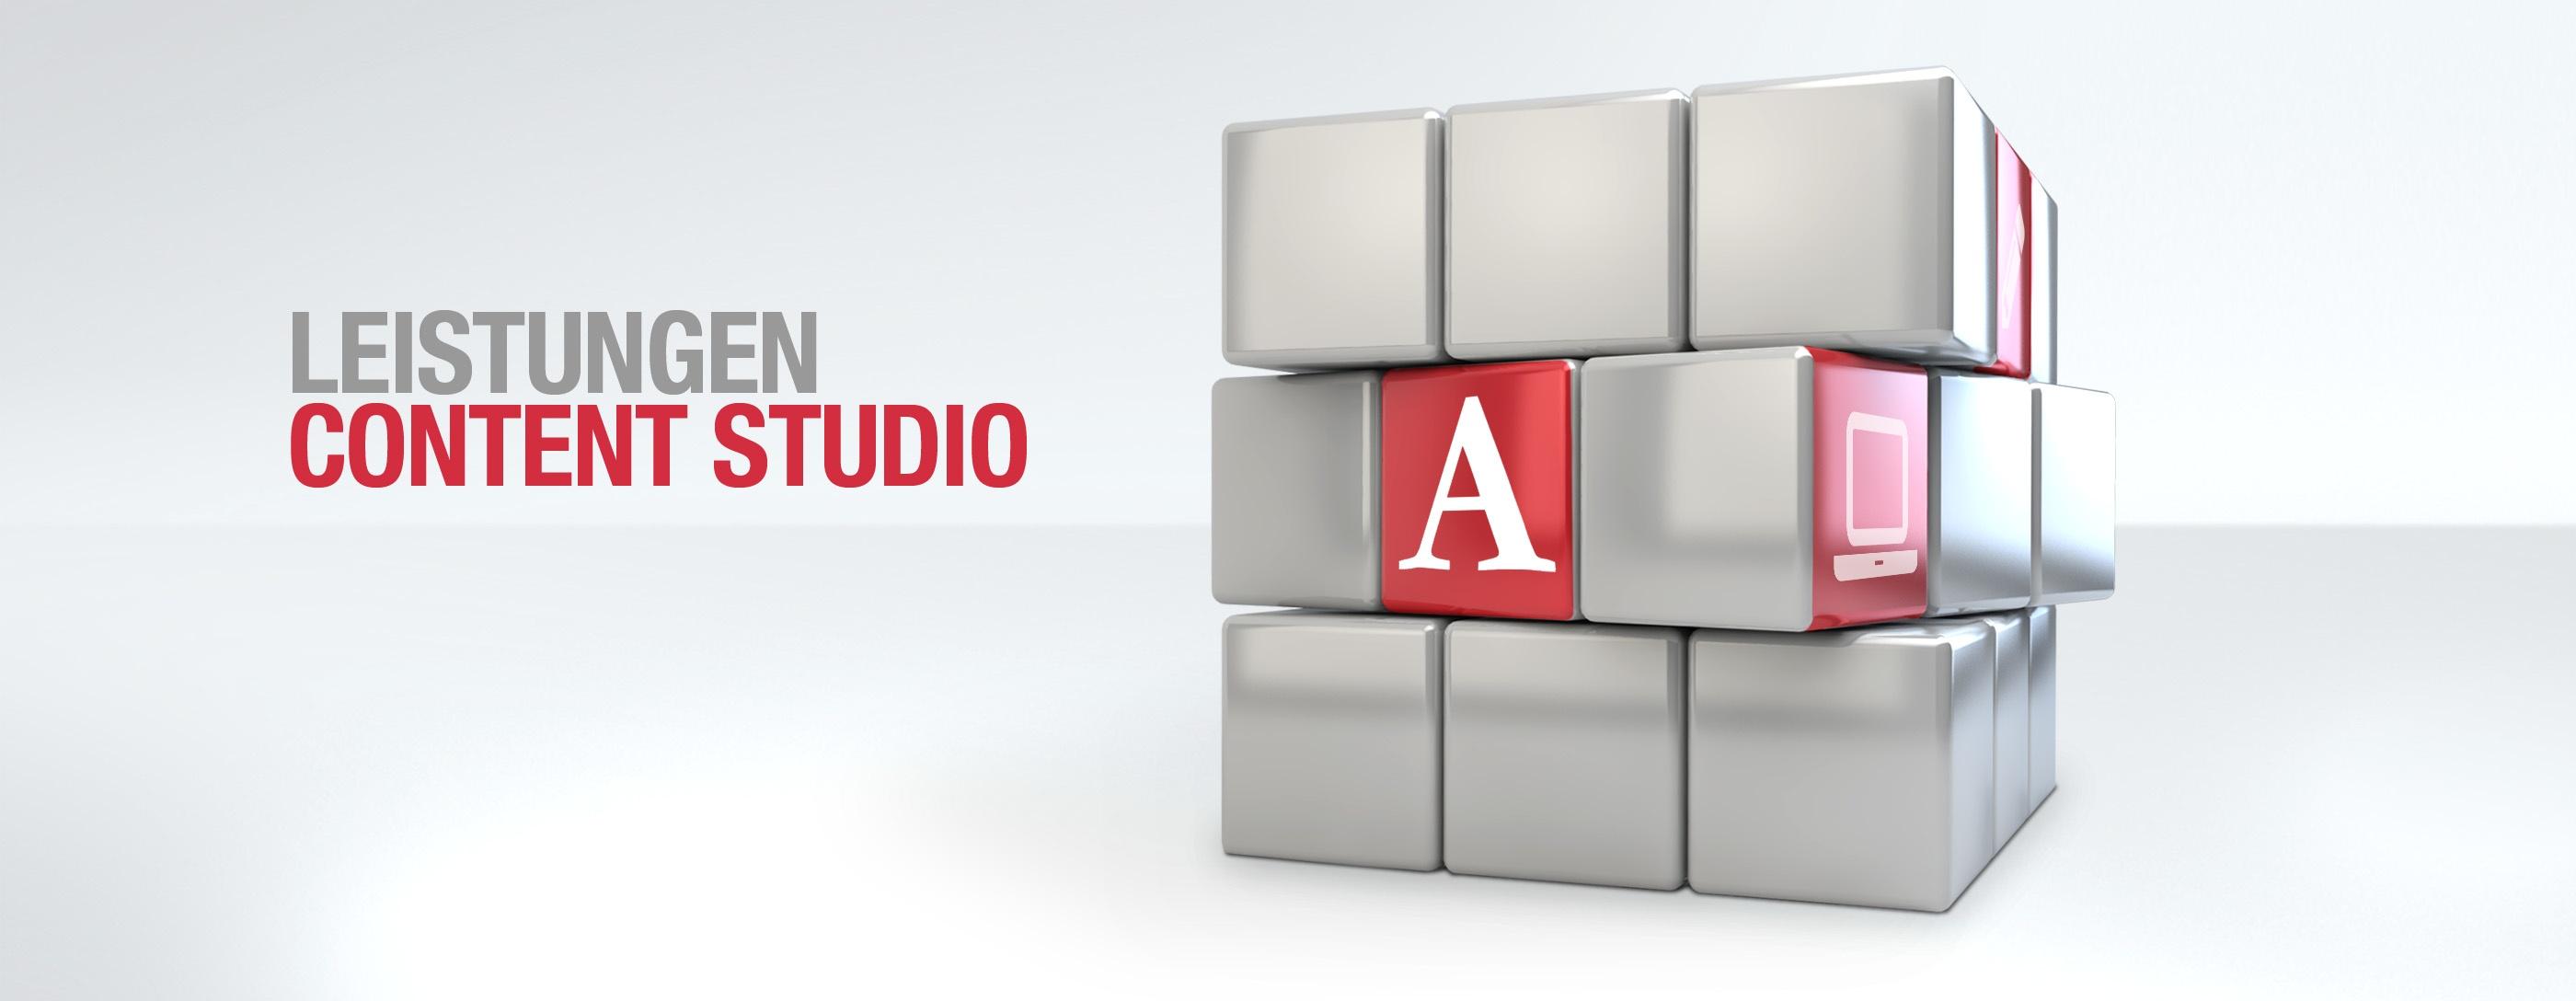 Leistungen Content Studio